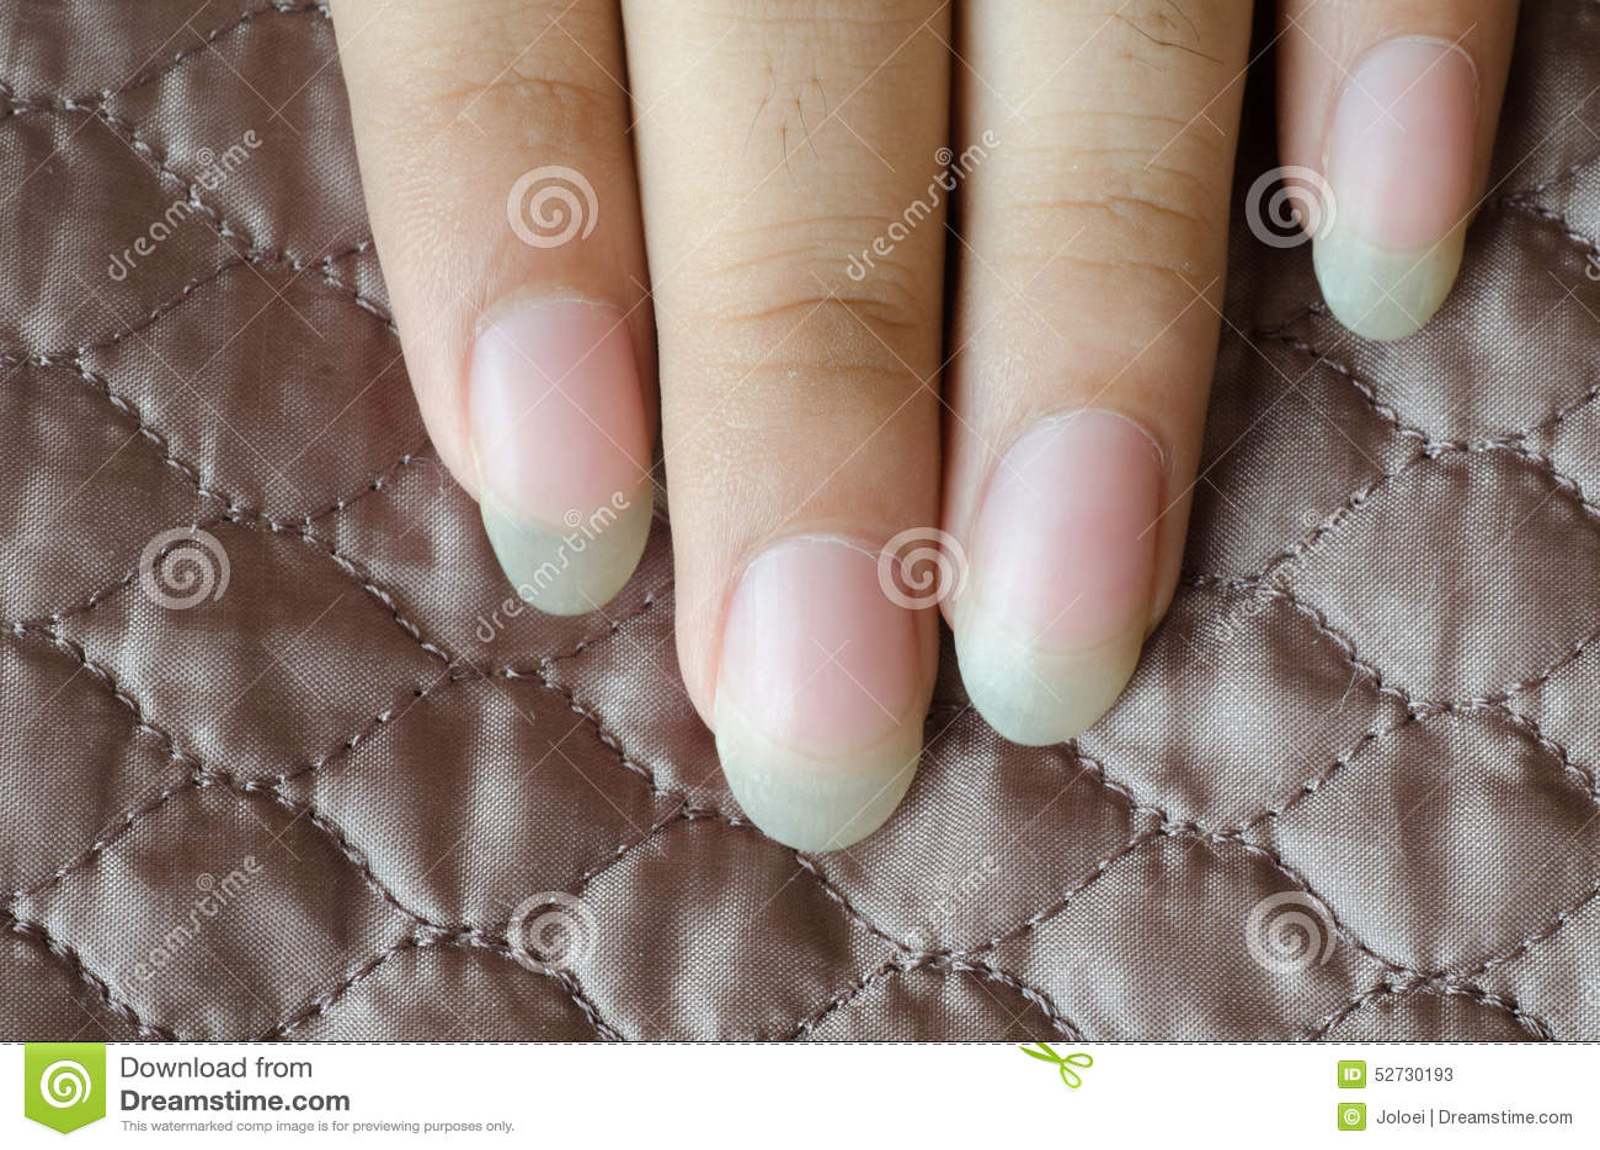 Long fingernails stock image. Image of manicure, fingernails - 52730193